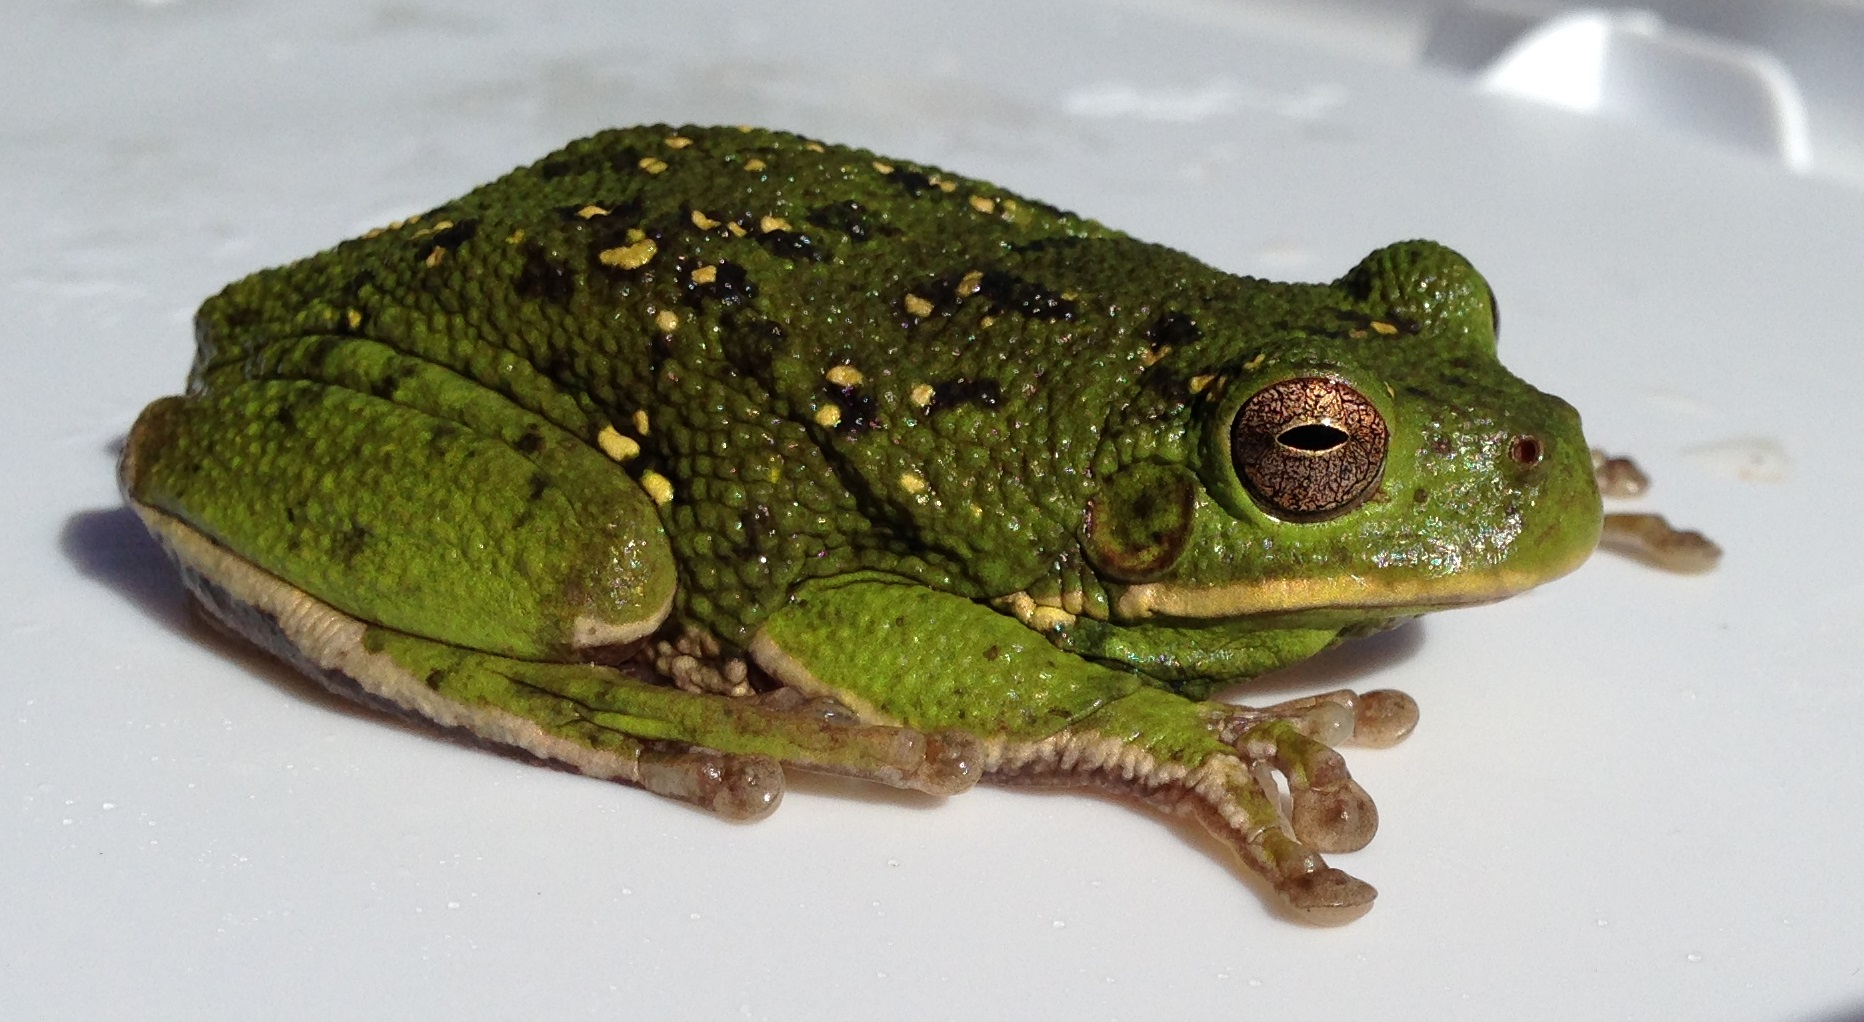 Barking Tree Frog (Dryophytes gratiosus)